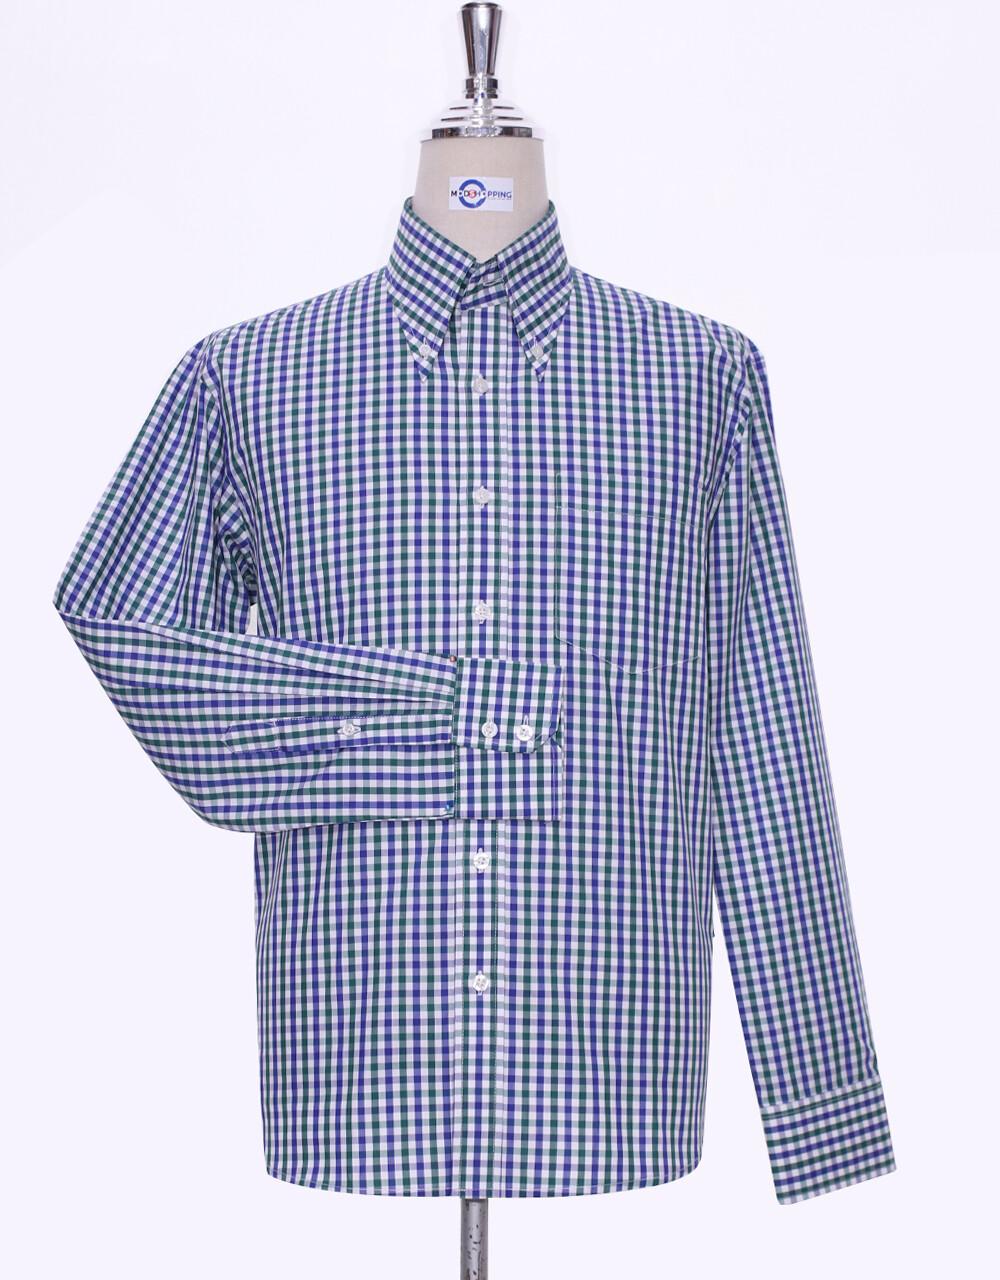 Button Down Shirt Blue And Green Gingham Check Shirt